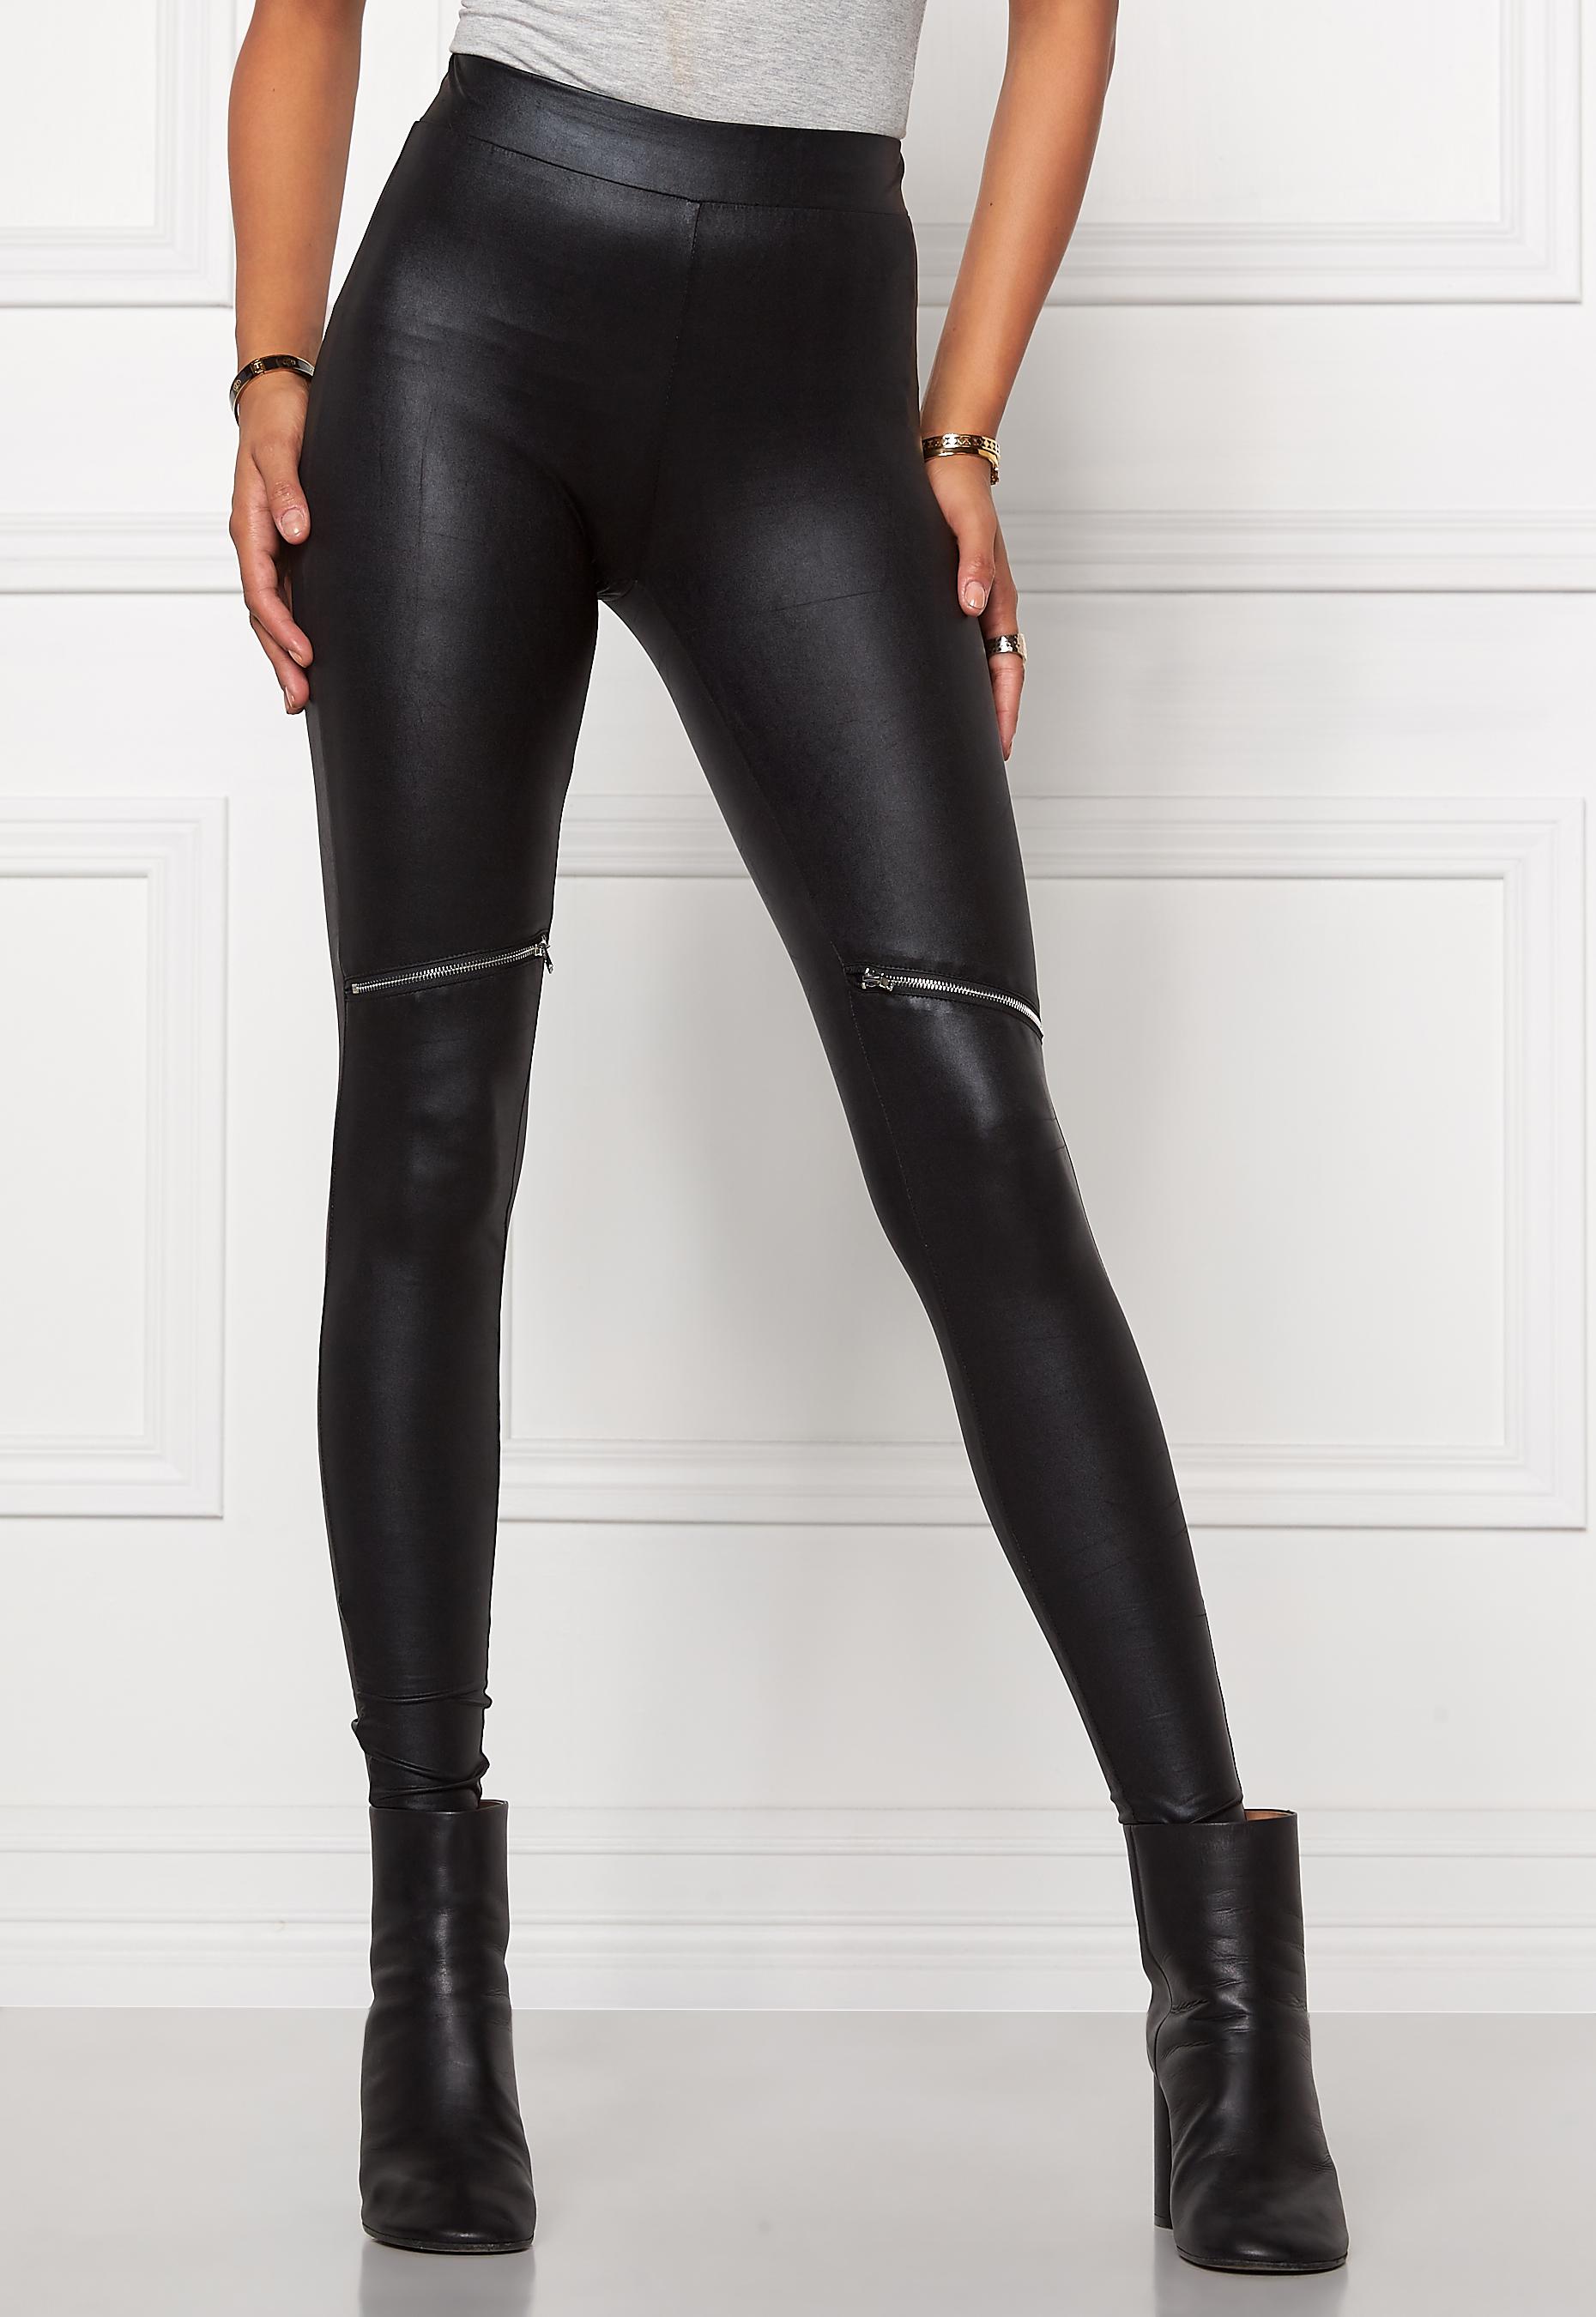 Chiara Forthi Zipped Shiny Leggings Black / Silver